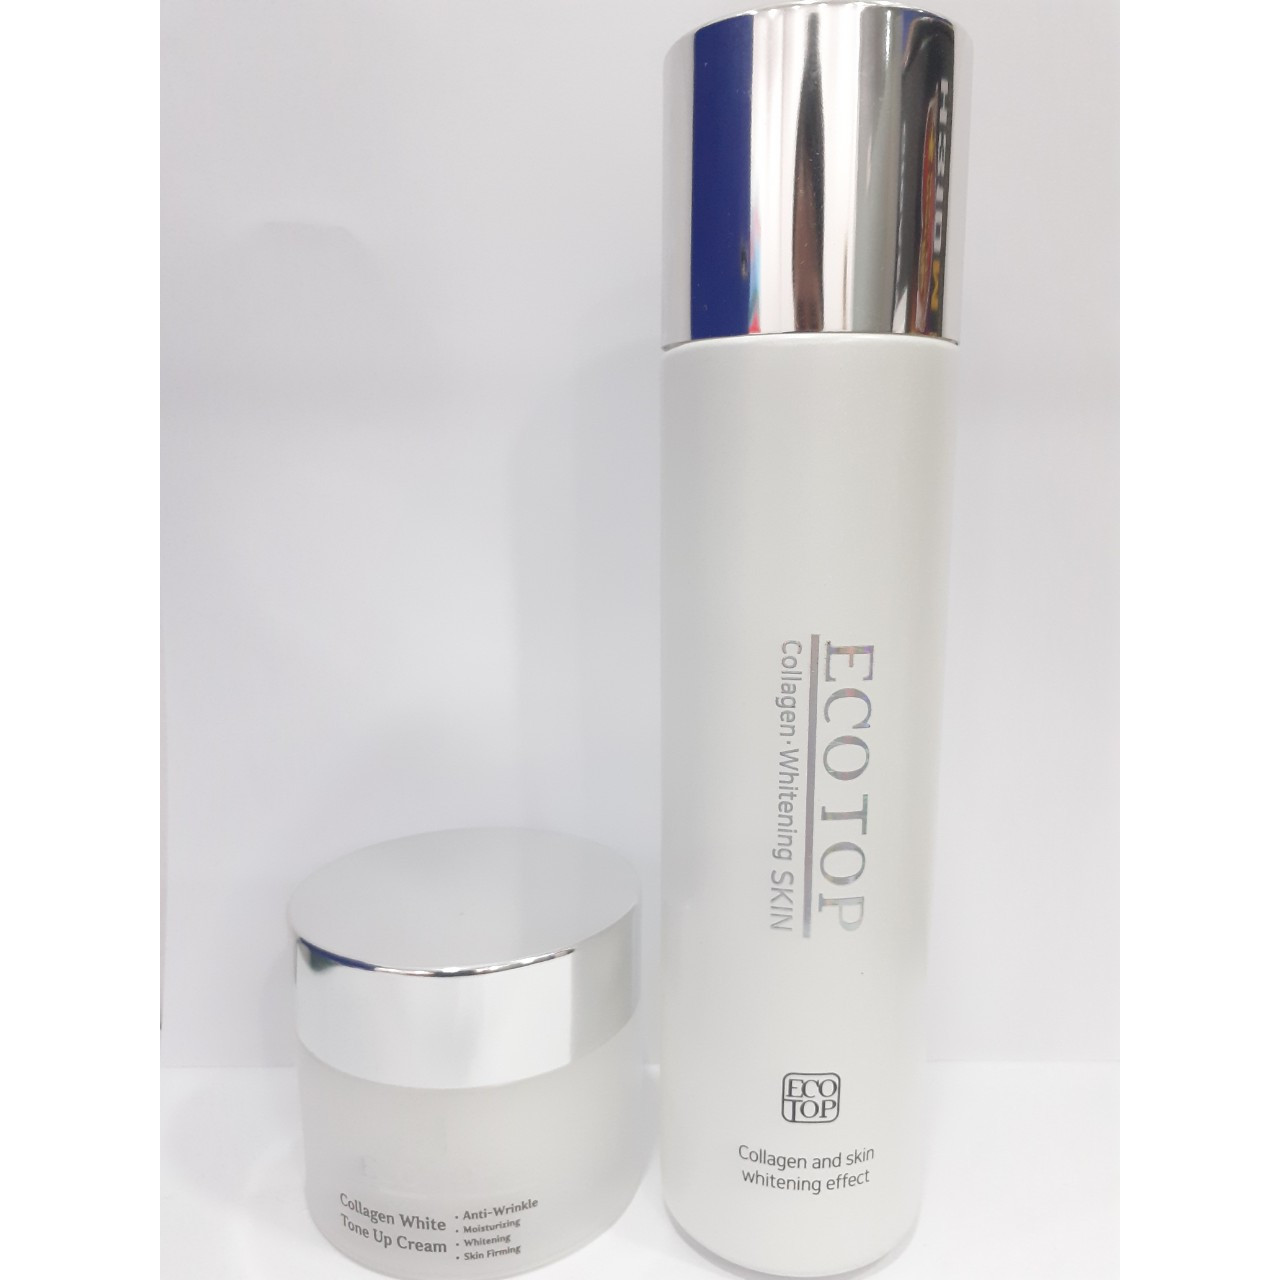 Combo Kem dưỡng da trắng da Collagen Ecotop + Nước hoa hồng Collagen trắng da Ecotop ( tặng 1 hộp mặt nạ Jant Blanc 10 miếng )